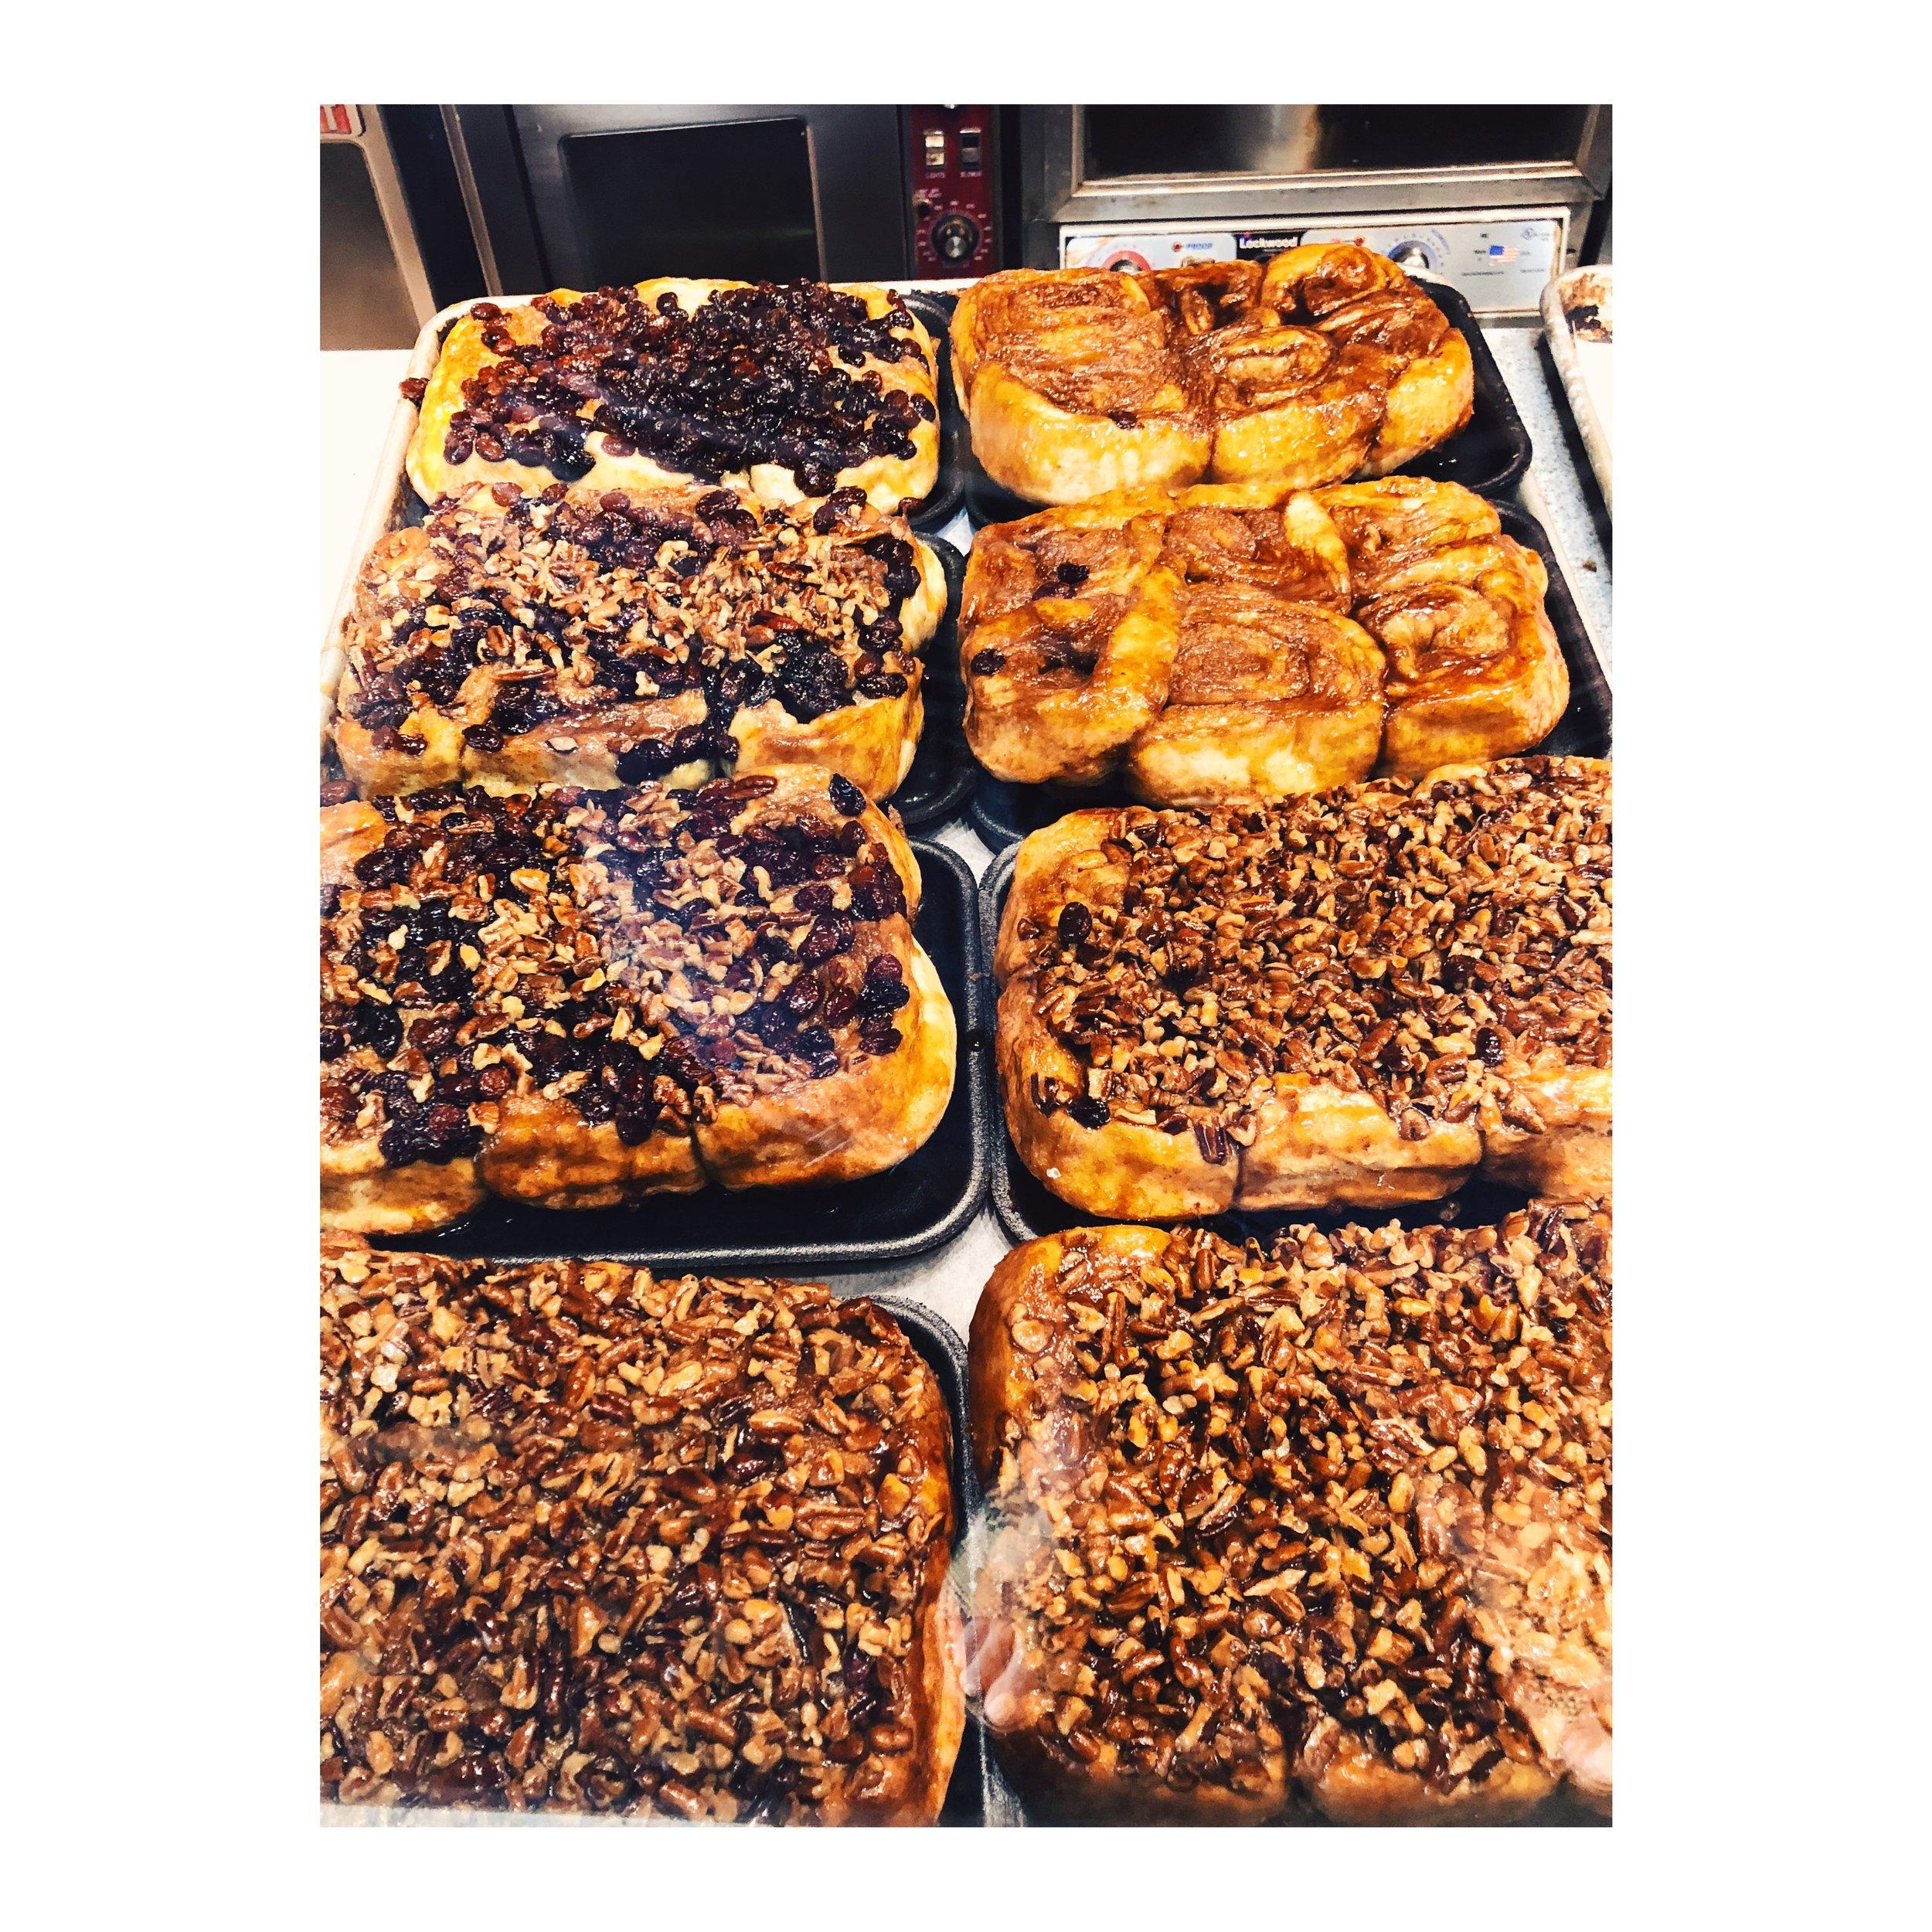 Cinnamon and raisin buns